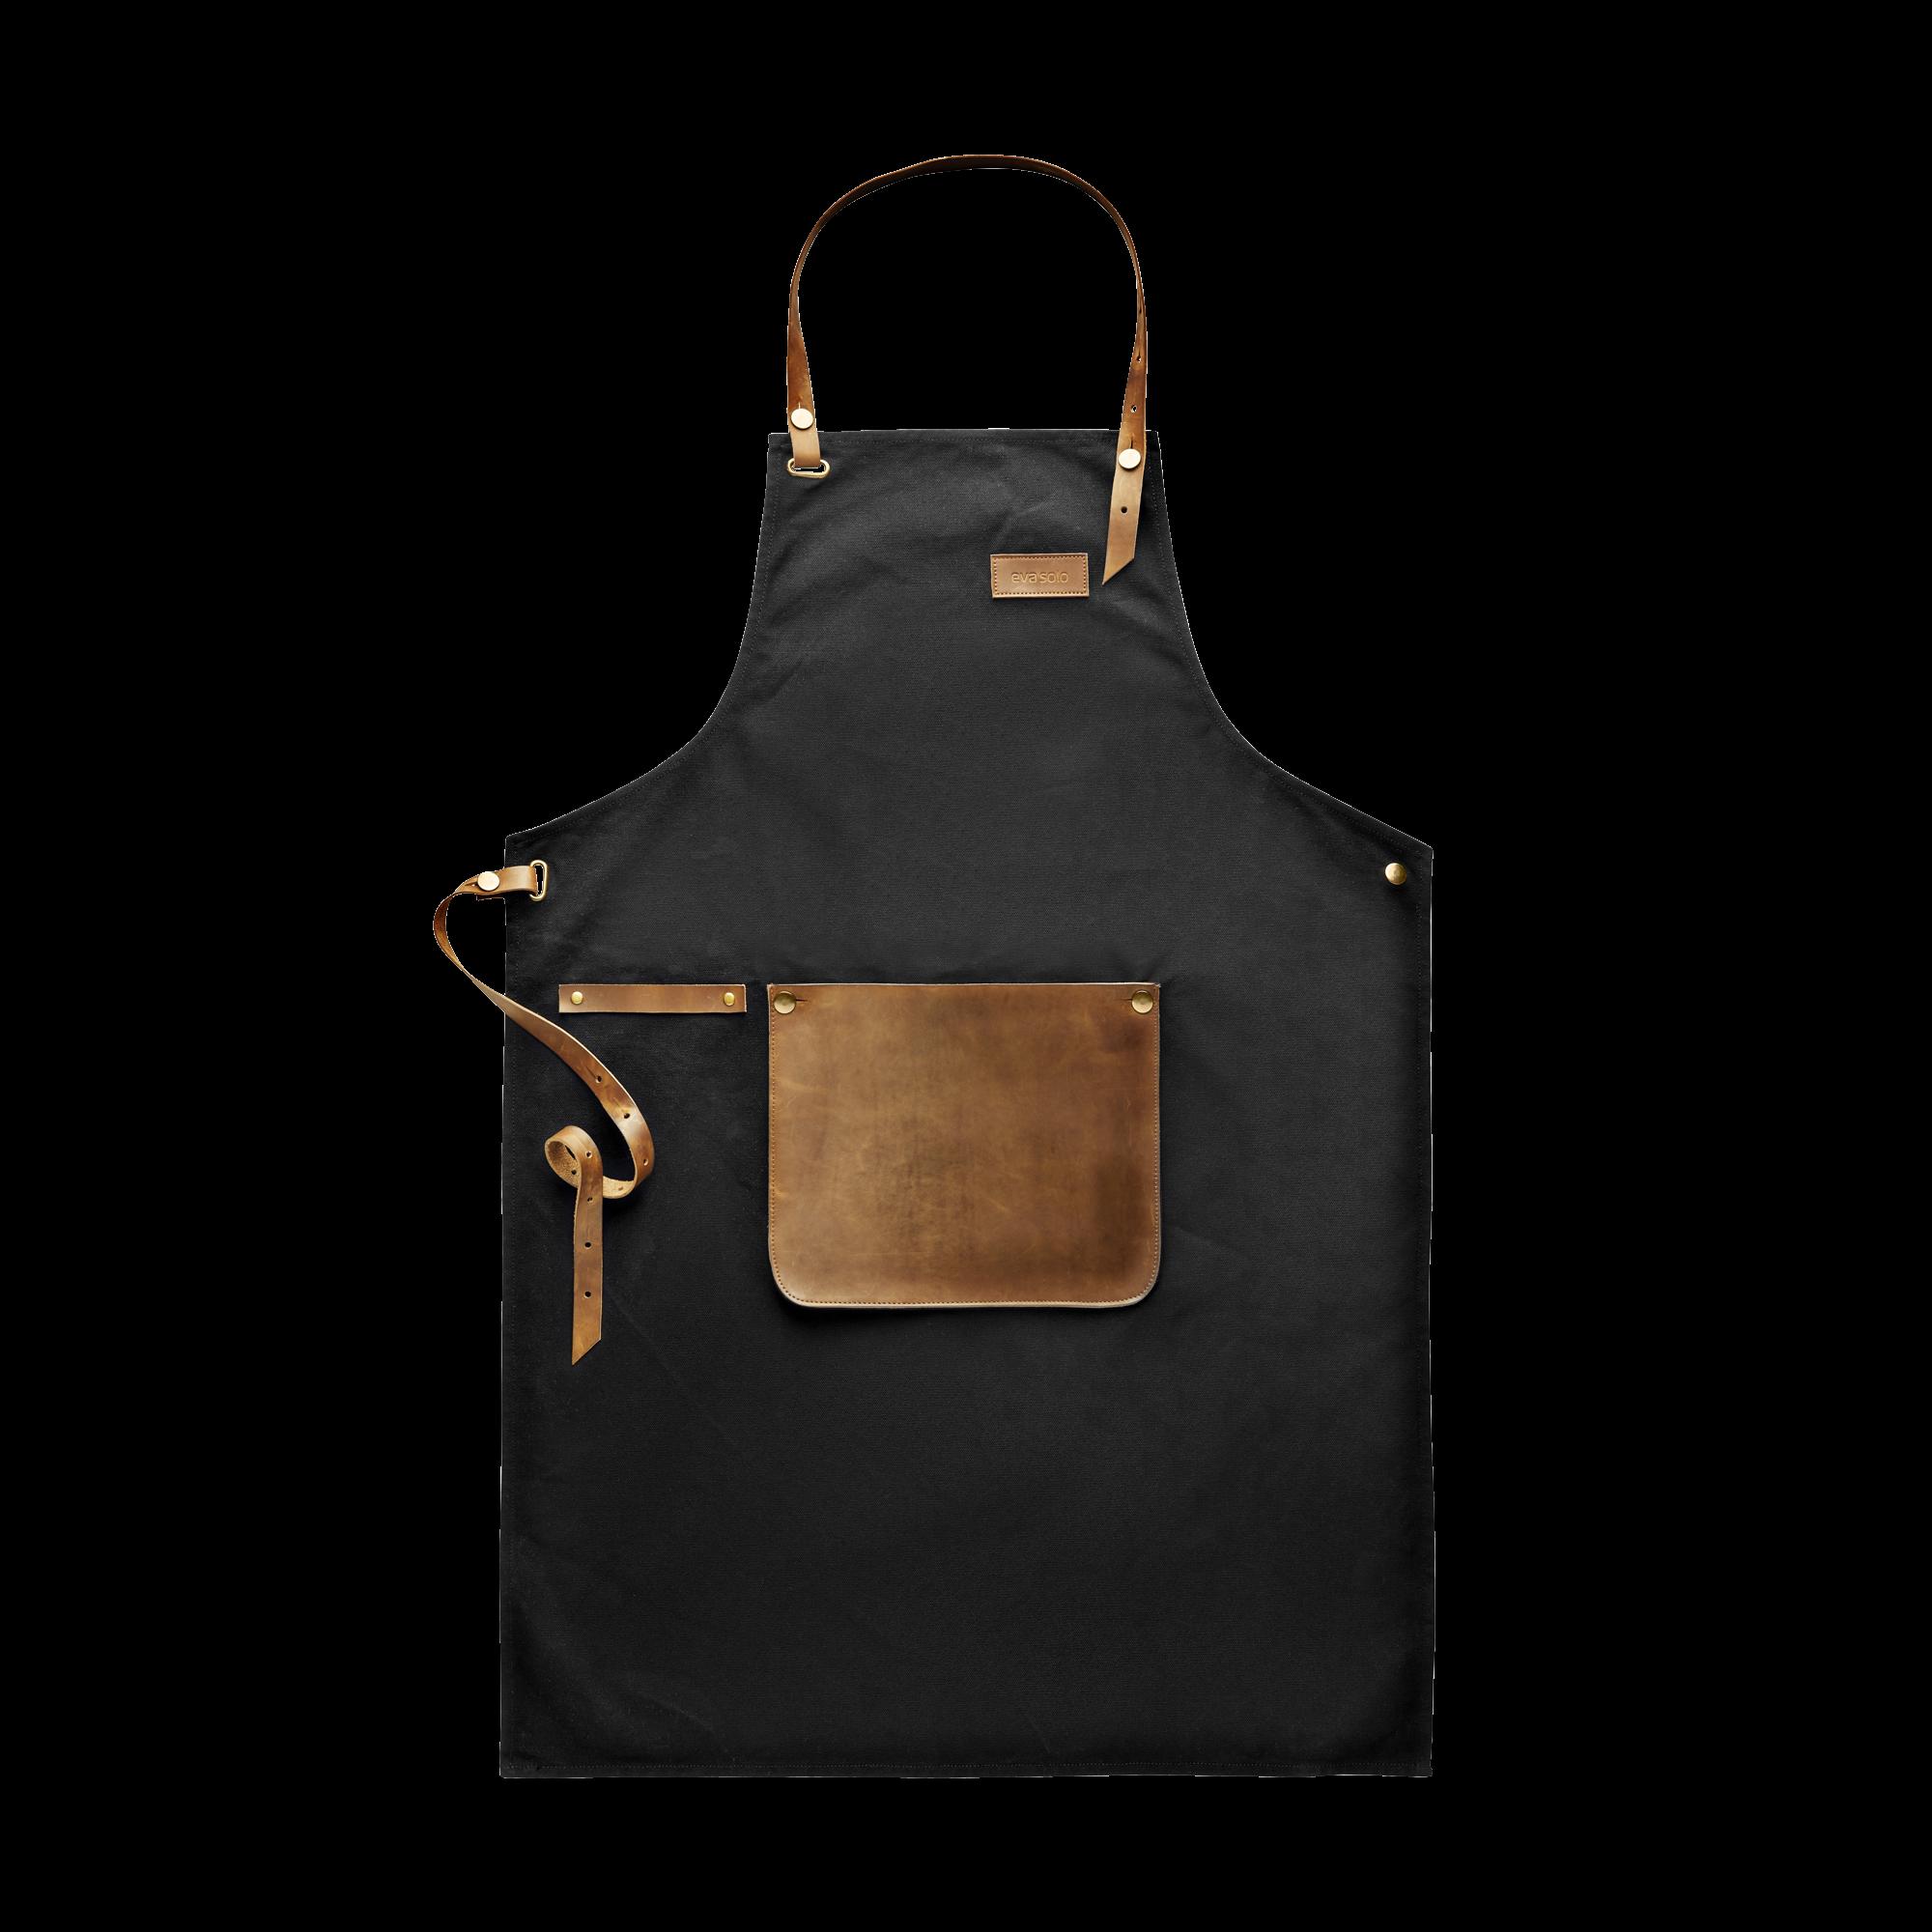 eva-solo-canvas-leather-apron-1